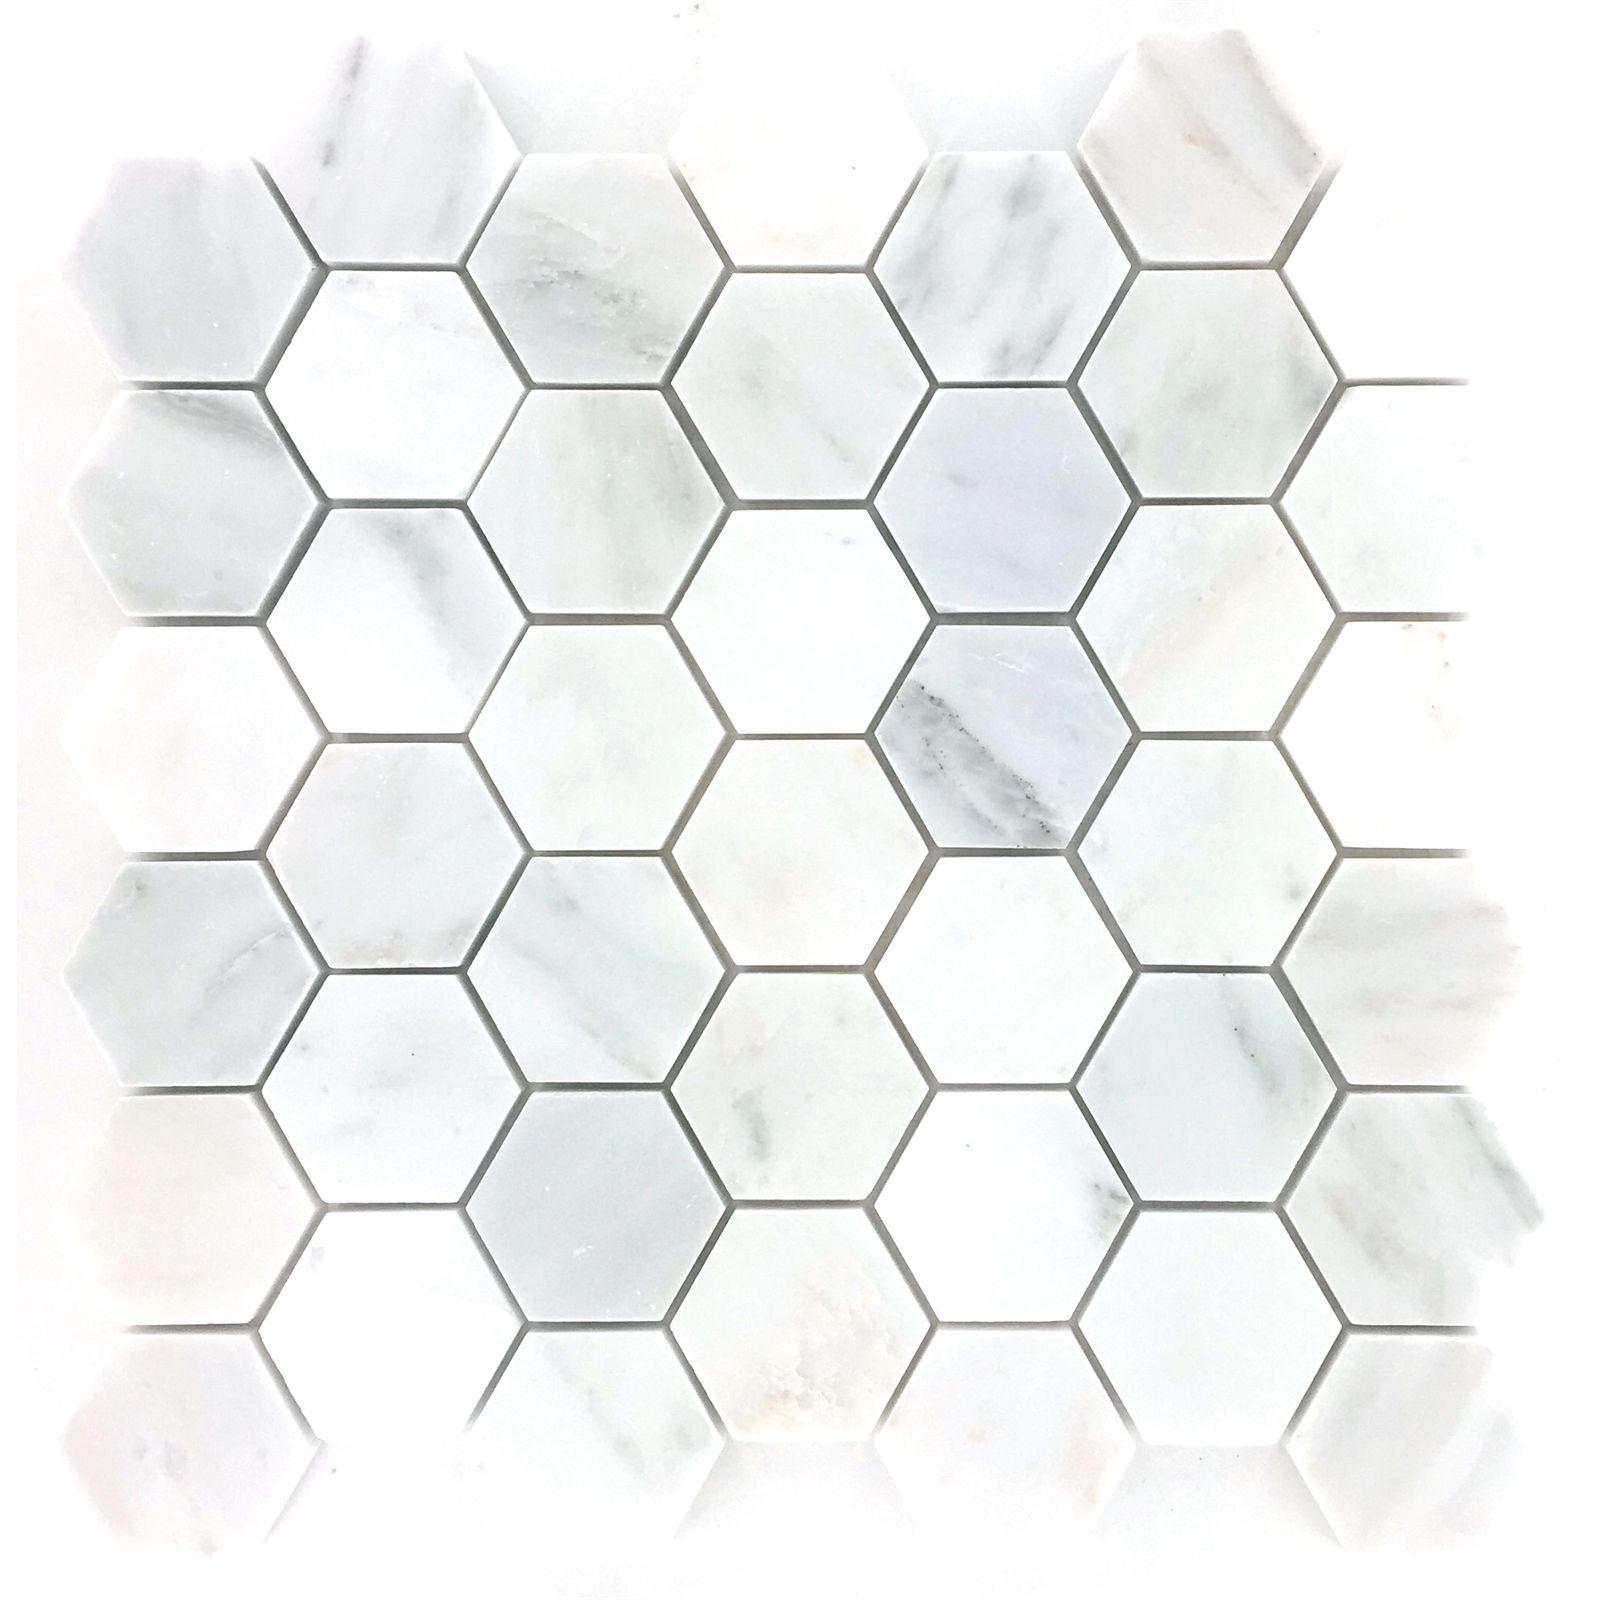 Decor8 Tiles 300 X 300 X 10mm Florentine White Marble Tile Mosaic White Marble Tiles Mosaic Tiles Marble Mosaic